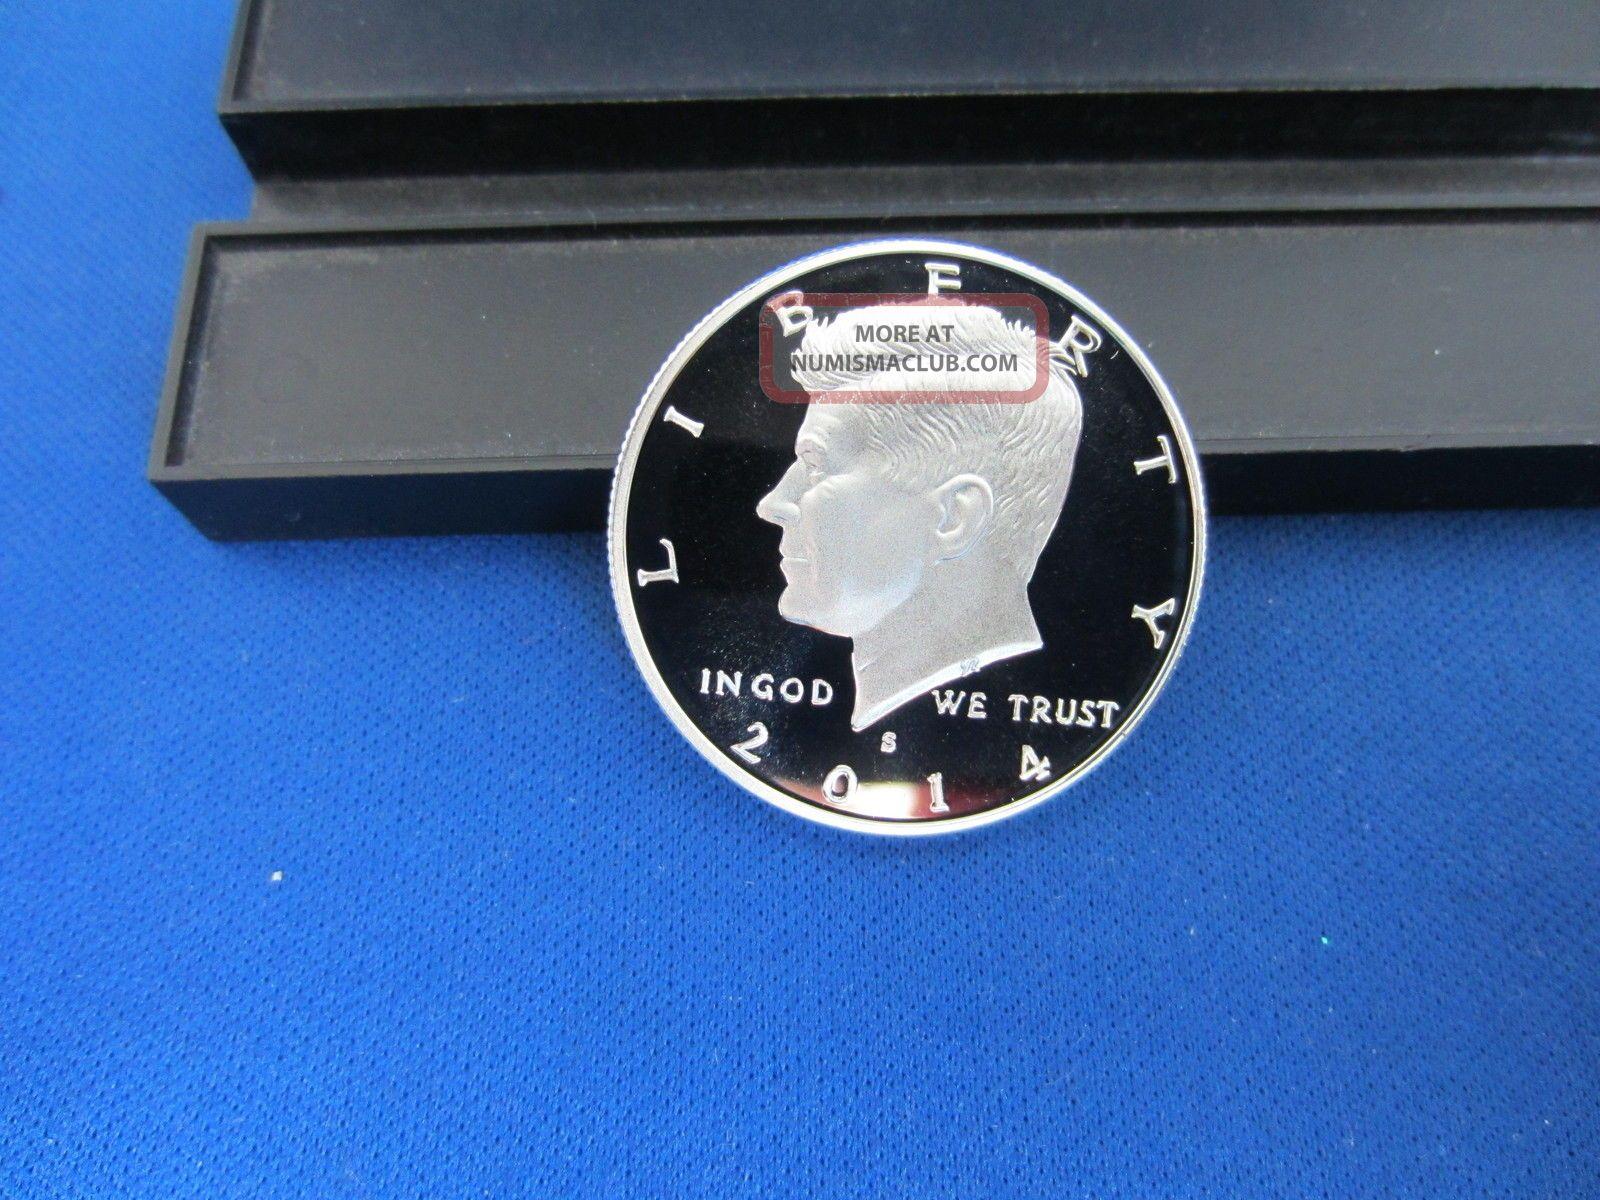 2014 - S Silver Kennedy Half Dollar Deep Cameo Mirror Proof Upper Grading Range Kennedy (1964-Now) photo